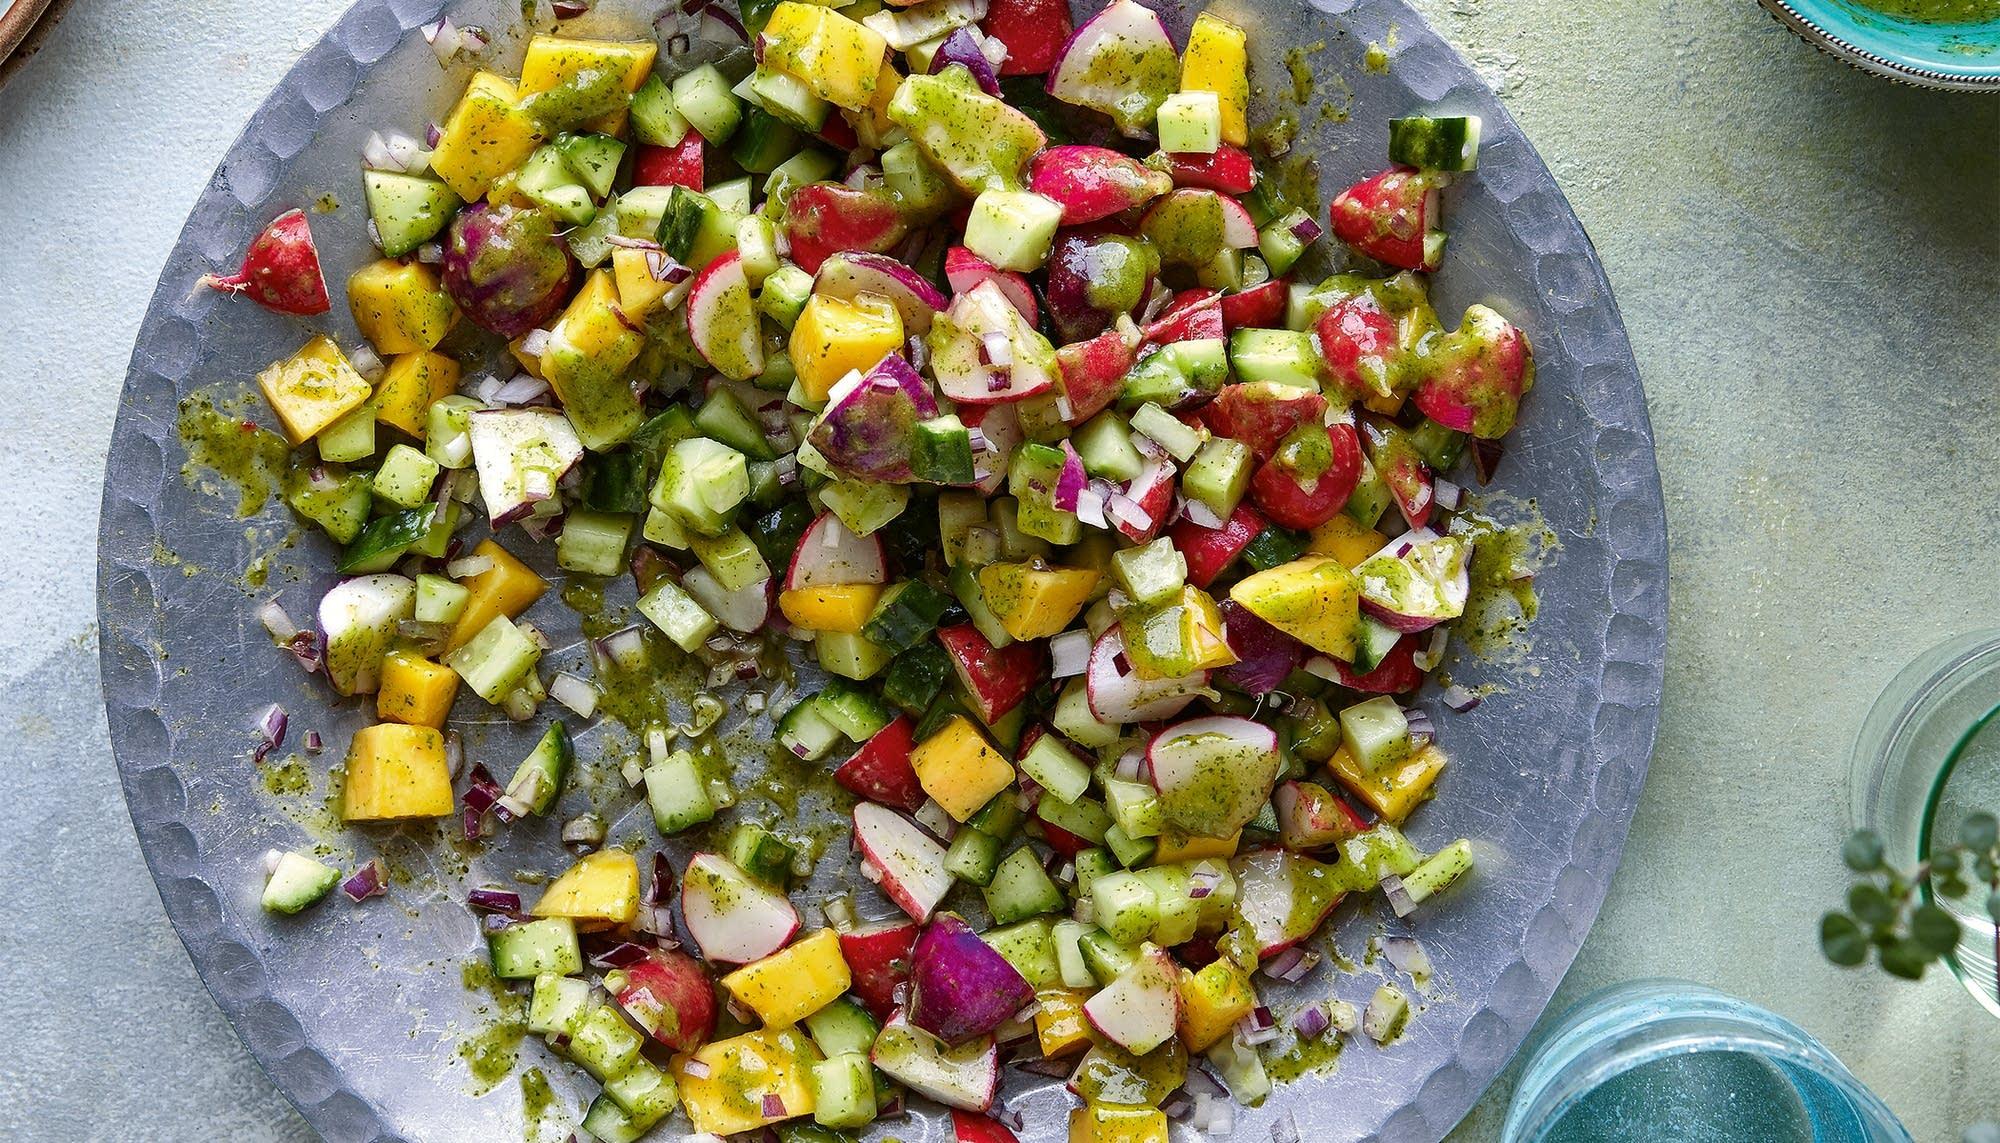 Mango Mint Salad The Splendid Table